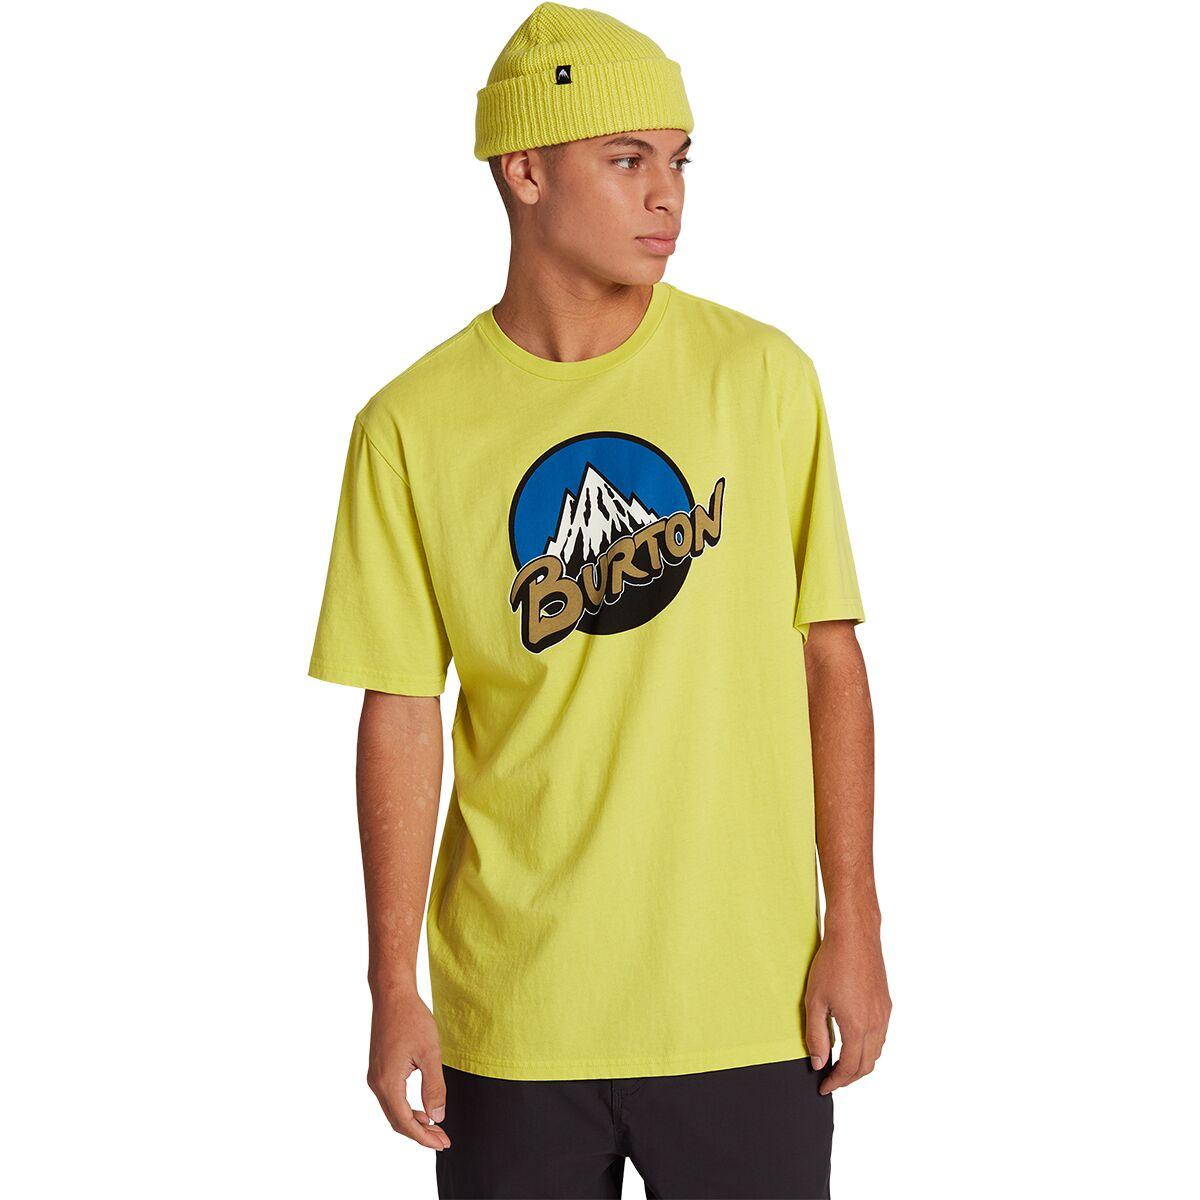 Retro Mountain T-Shirt - Men